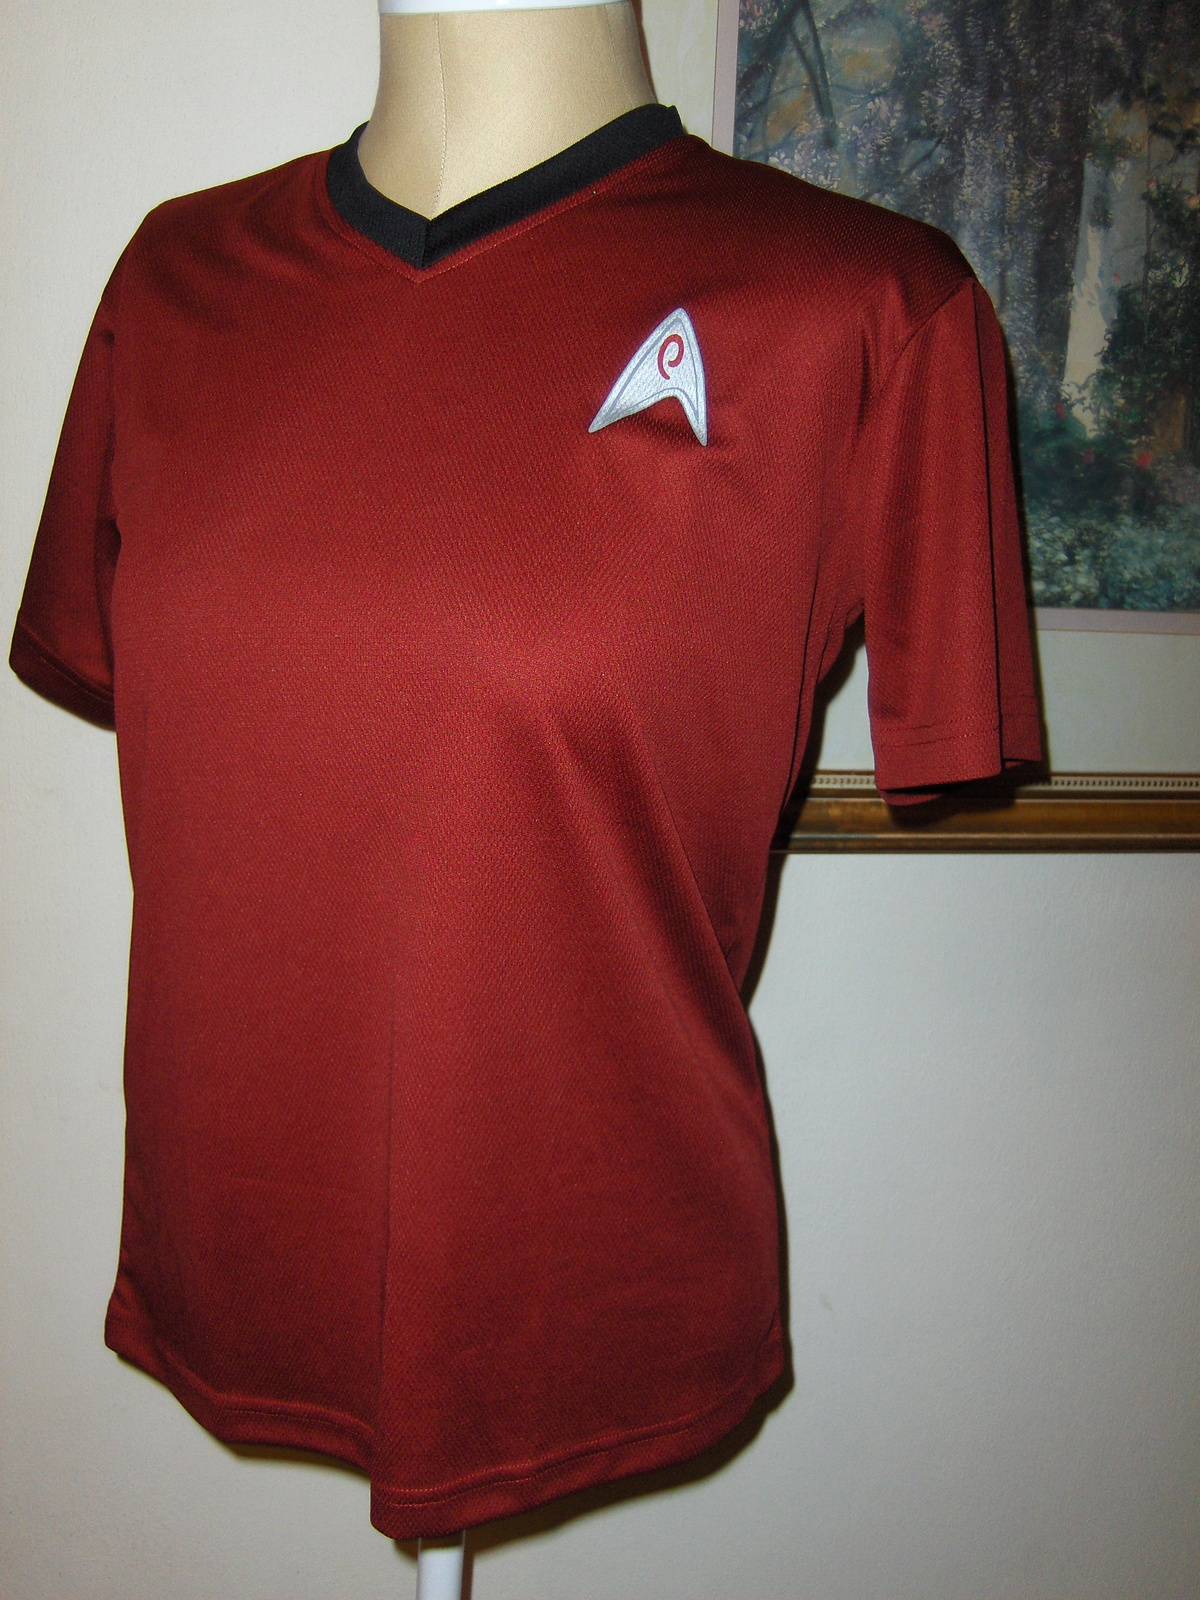 Kellogg's Star Trek Red T-Shirt Unisex Size Small  2009